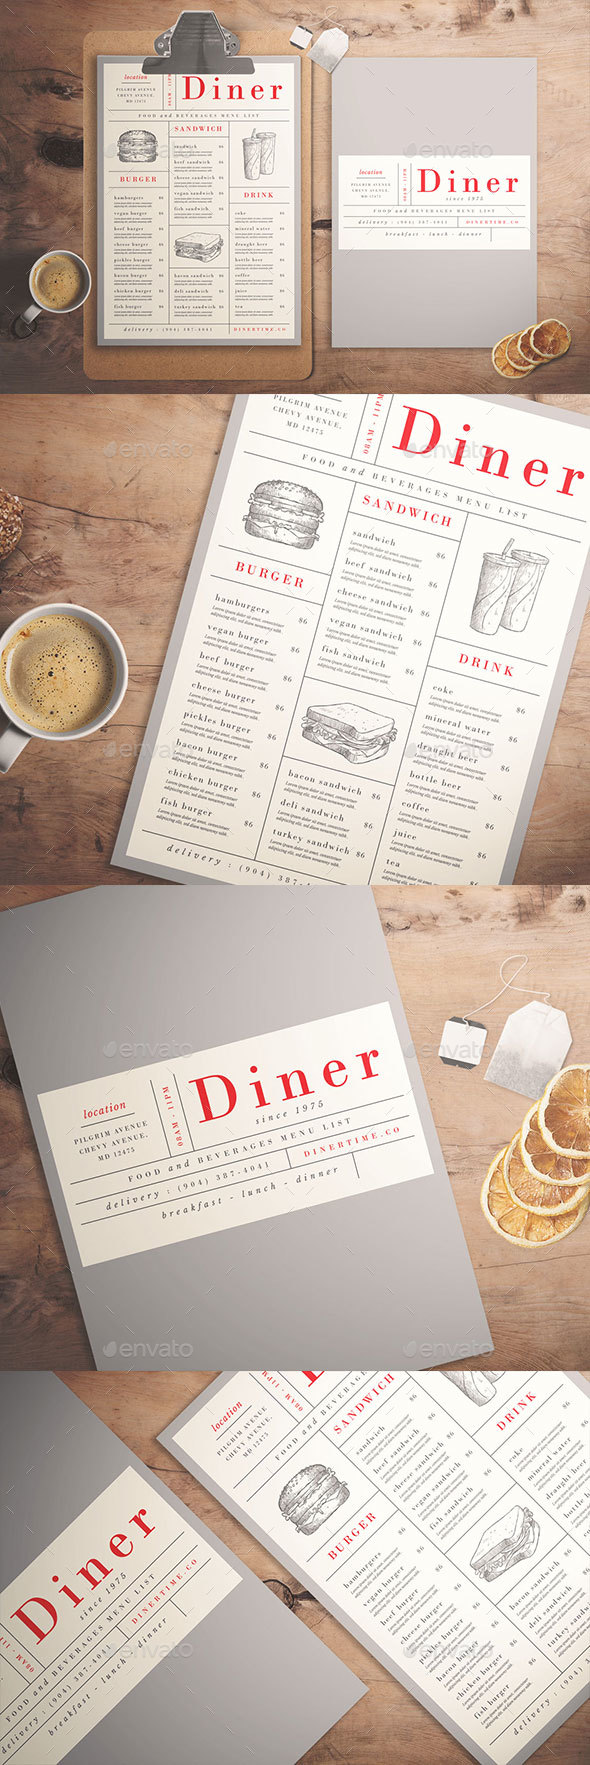 GraphicRiver Food Menu Vol 02 21127273